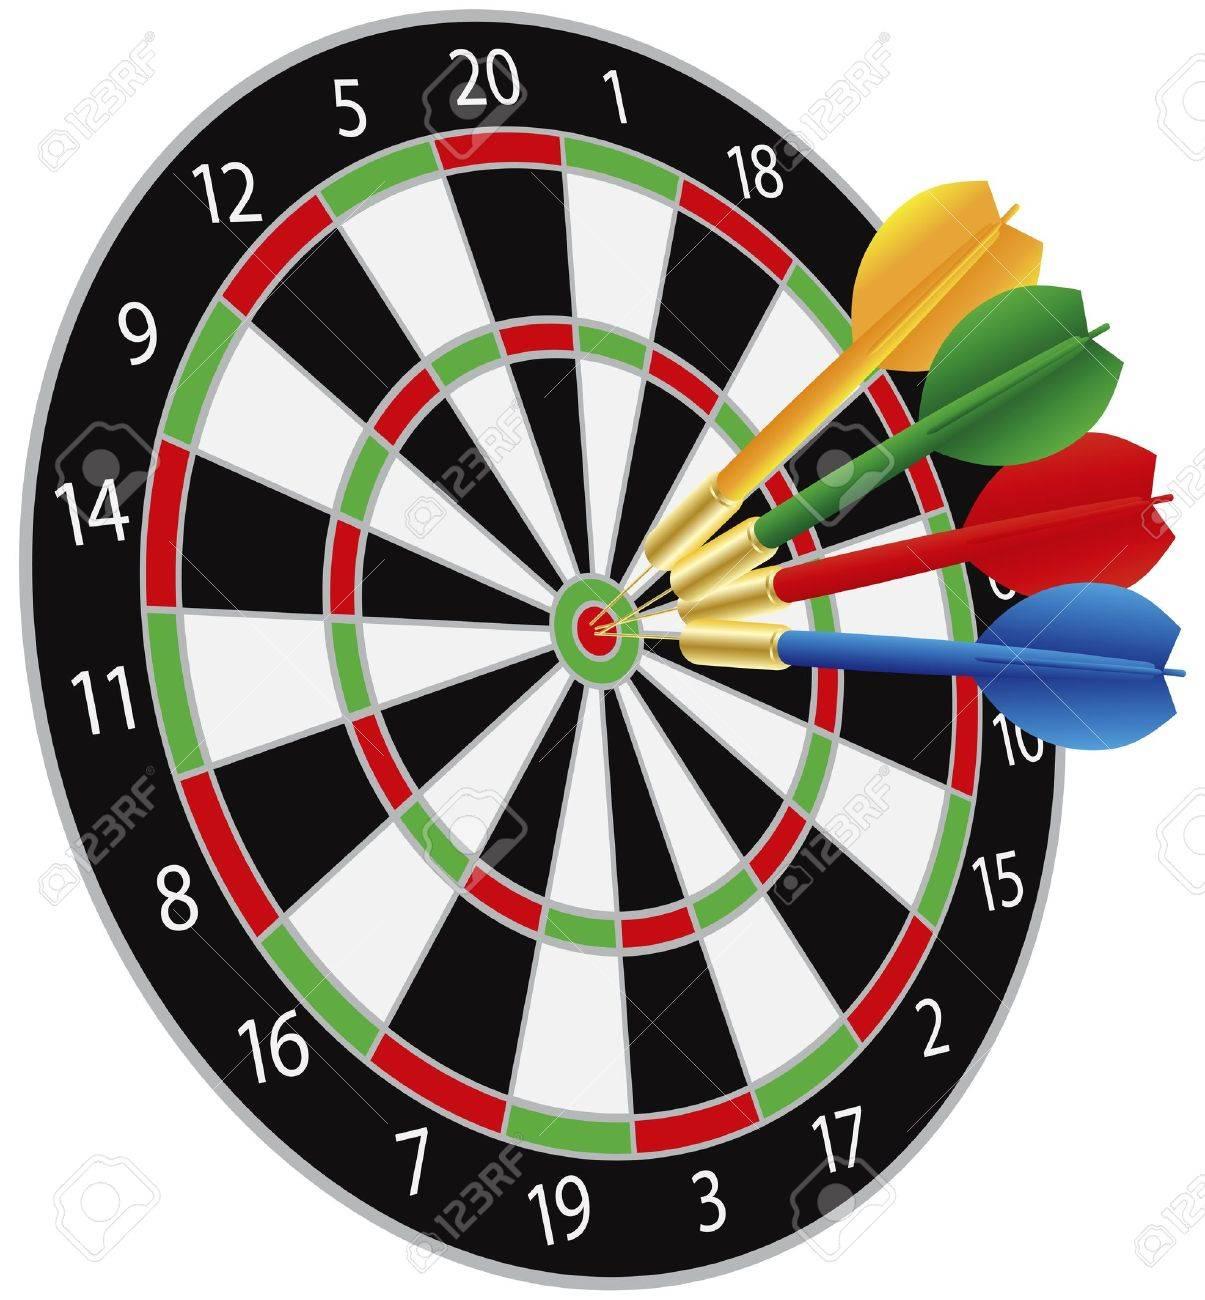 dartboard with darts hitting on target bullseye illustration